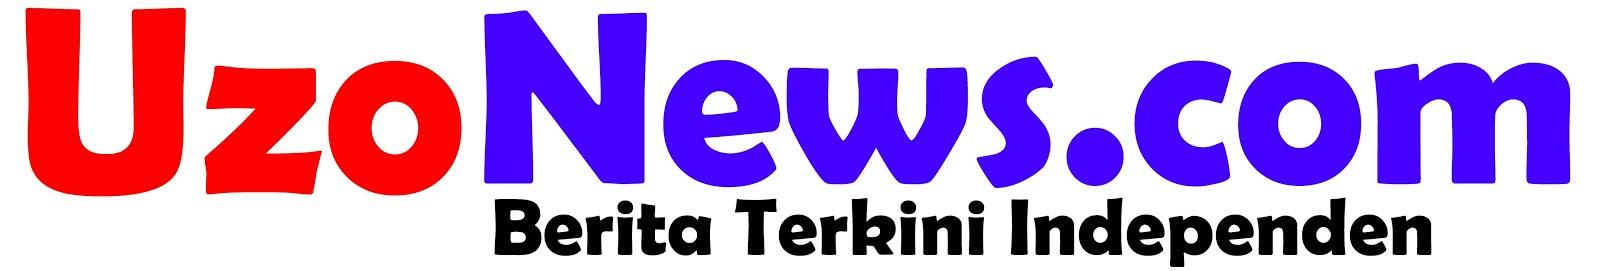 Uzonews - Media Pergerakan Online